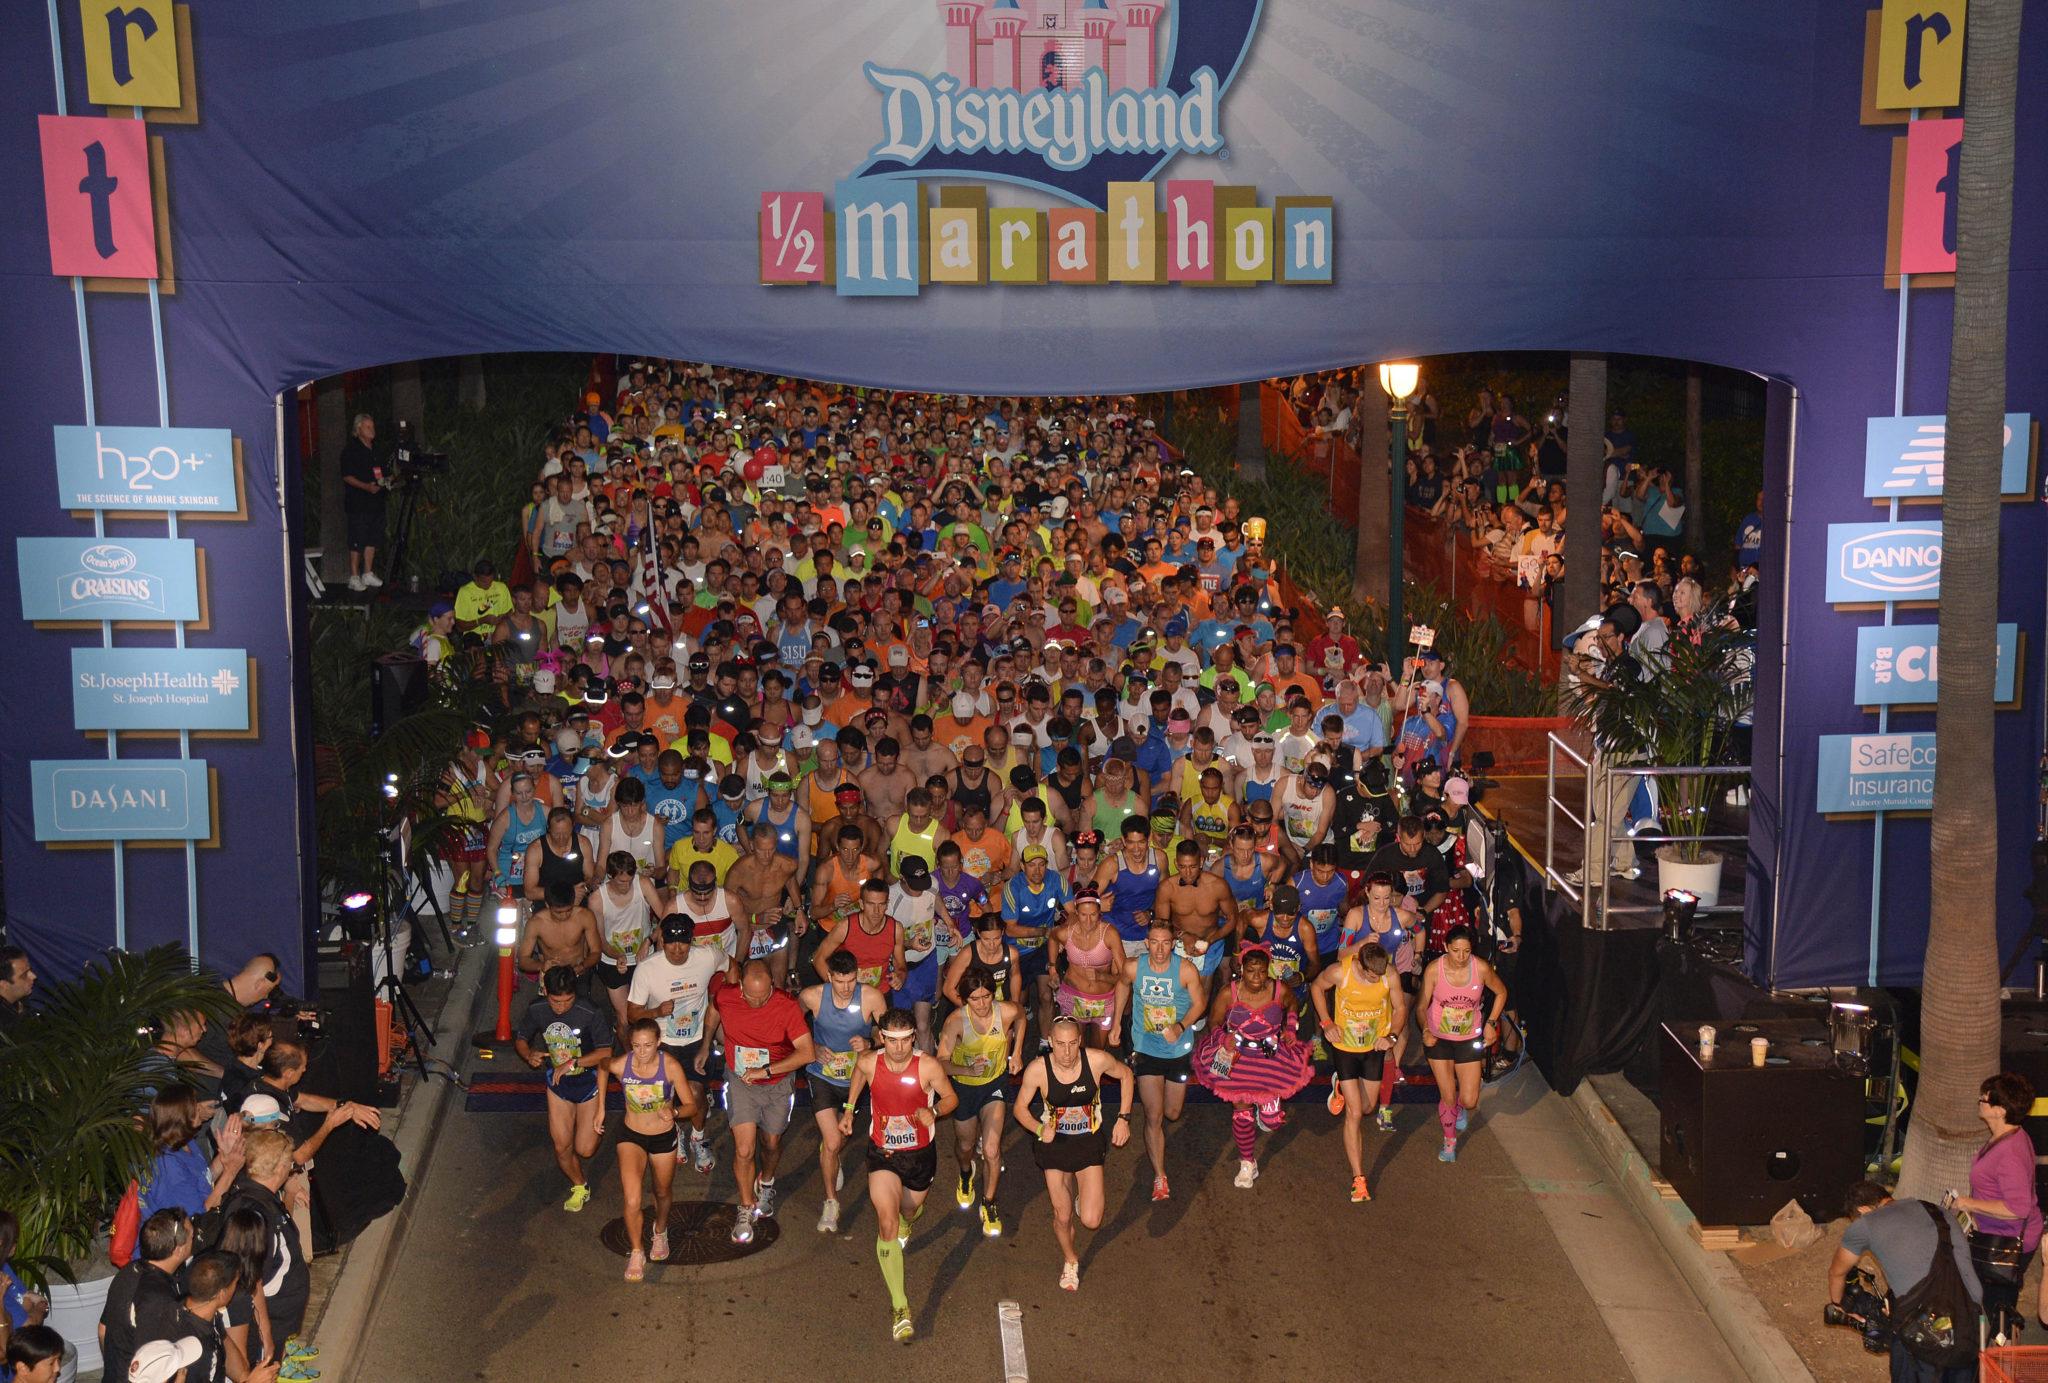 Disneyland Half Marathon Starting Line. Photo credit: Laughing Place.